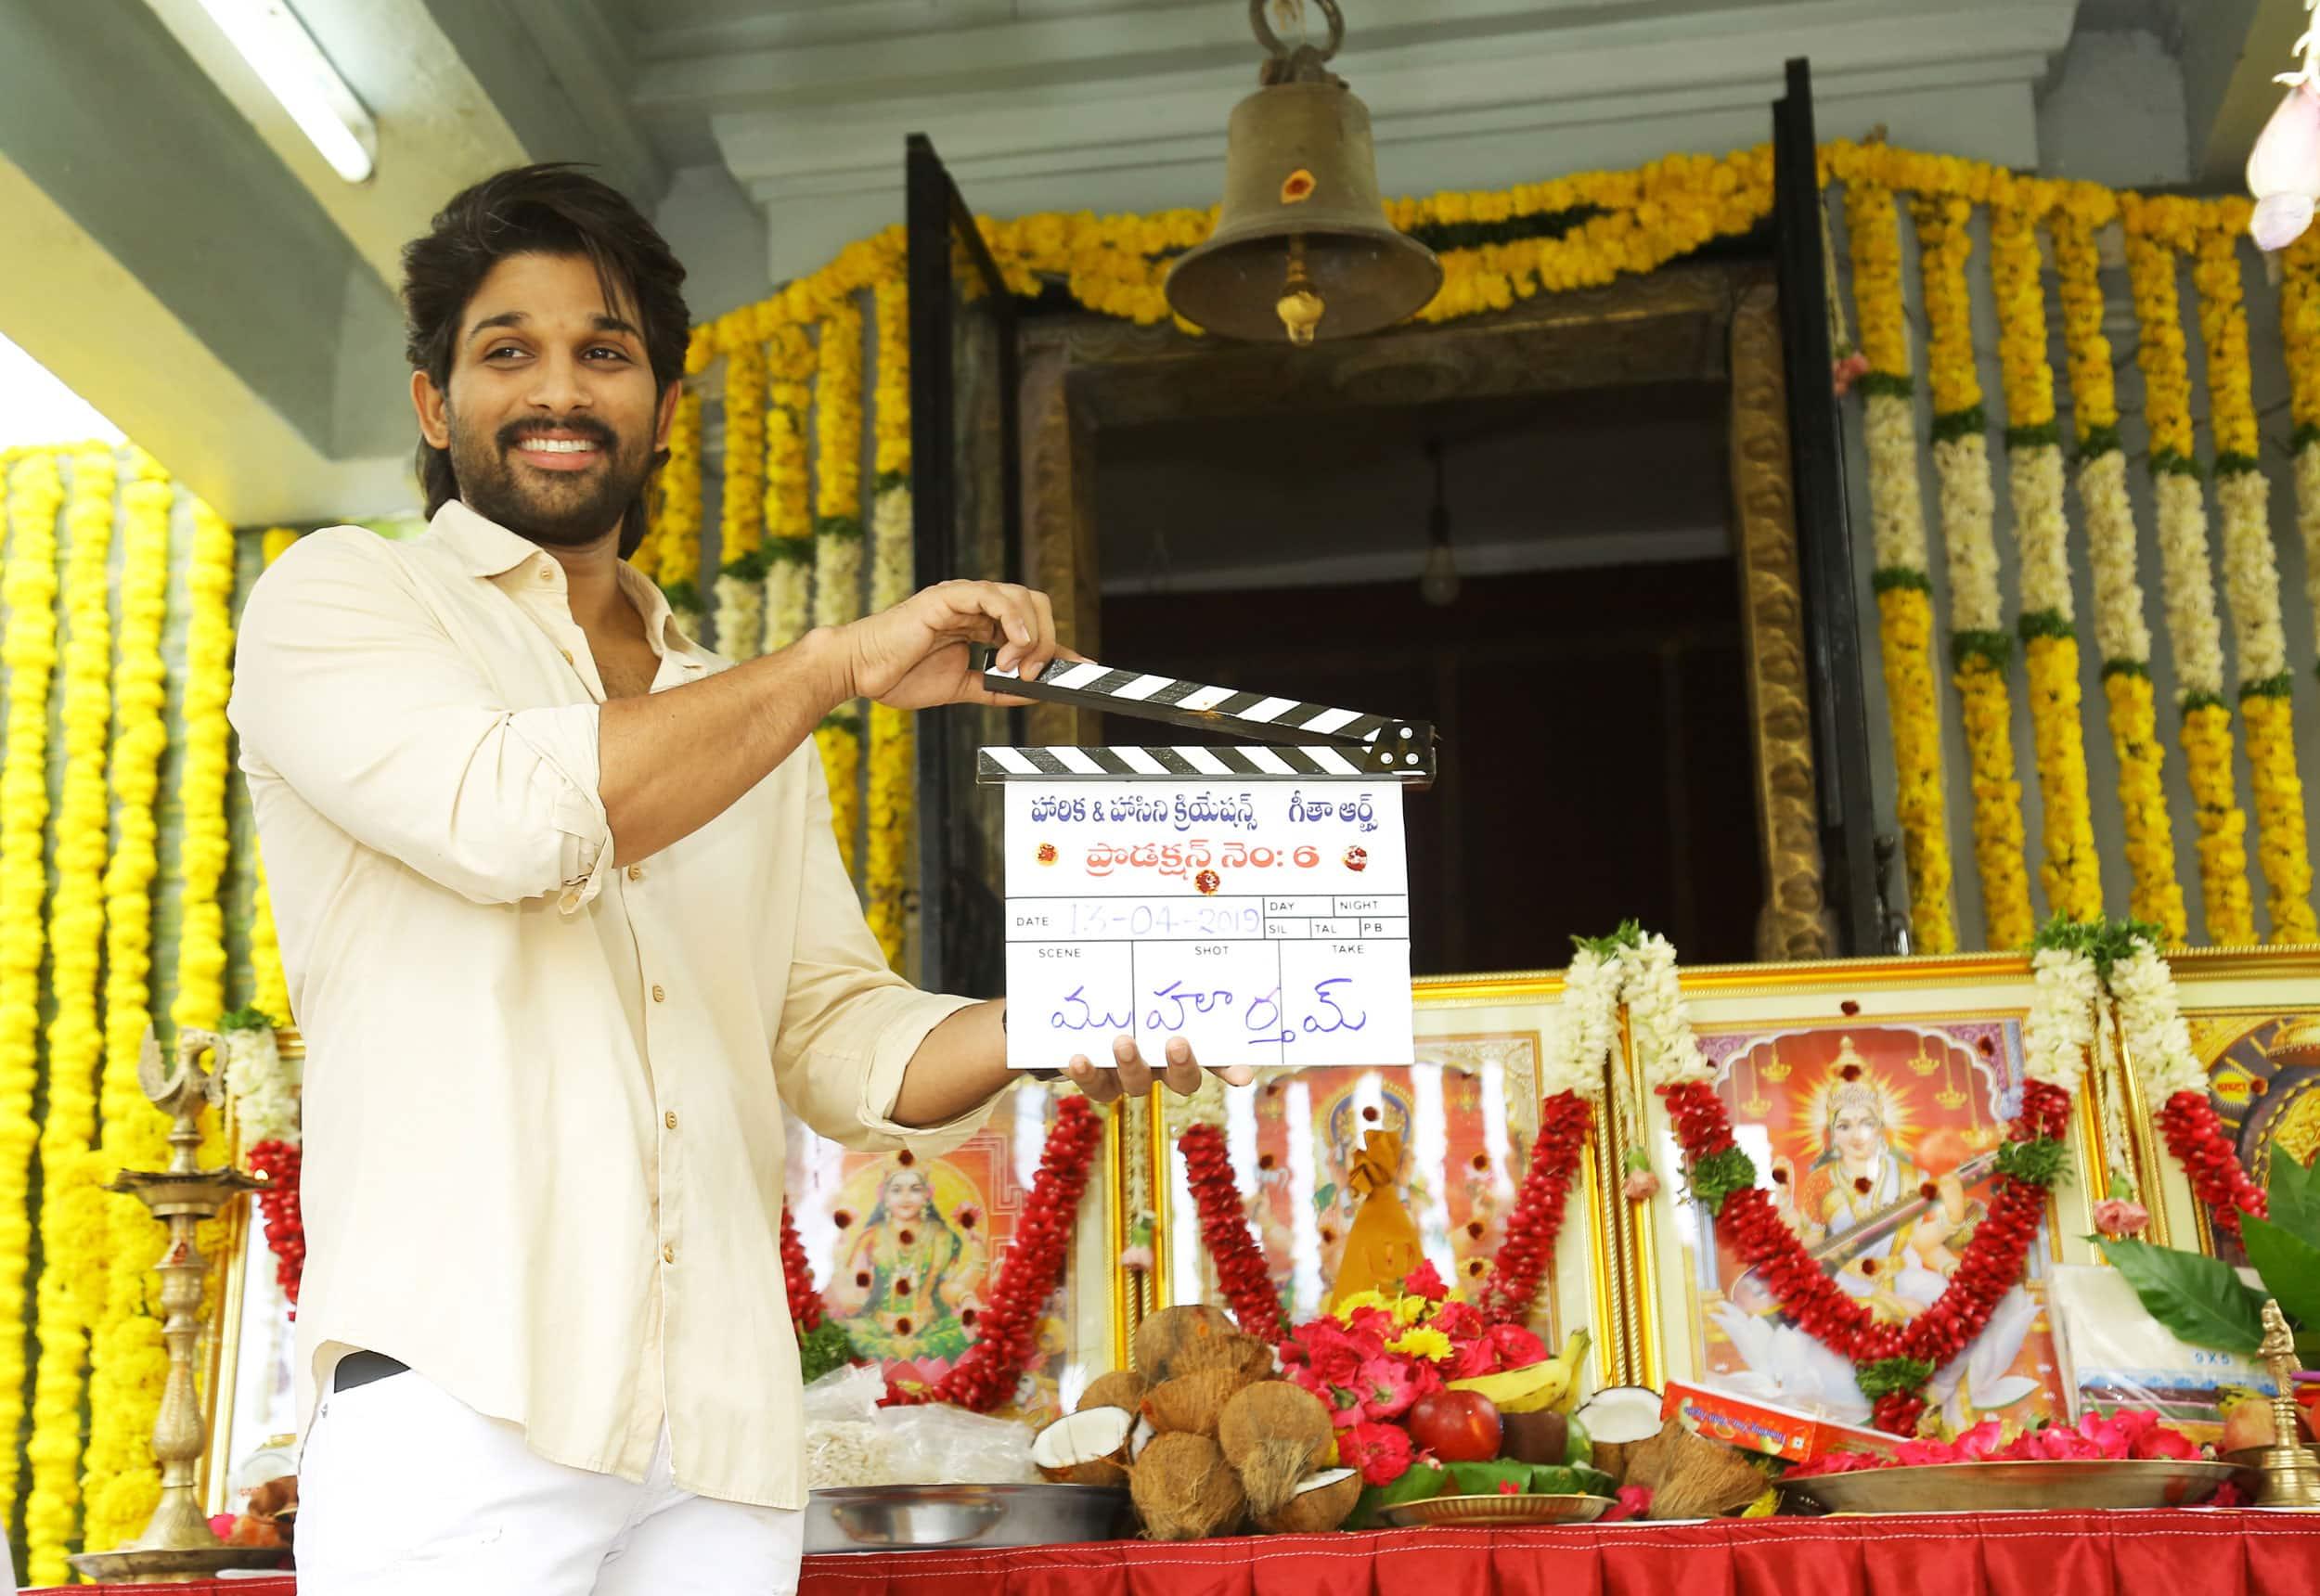 Allu Arjun and Trivikram Srinivas' film to go on floors from